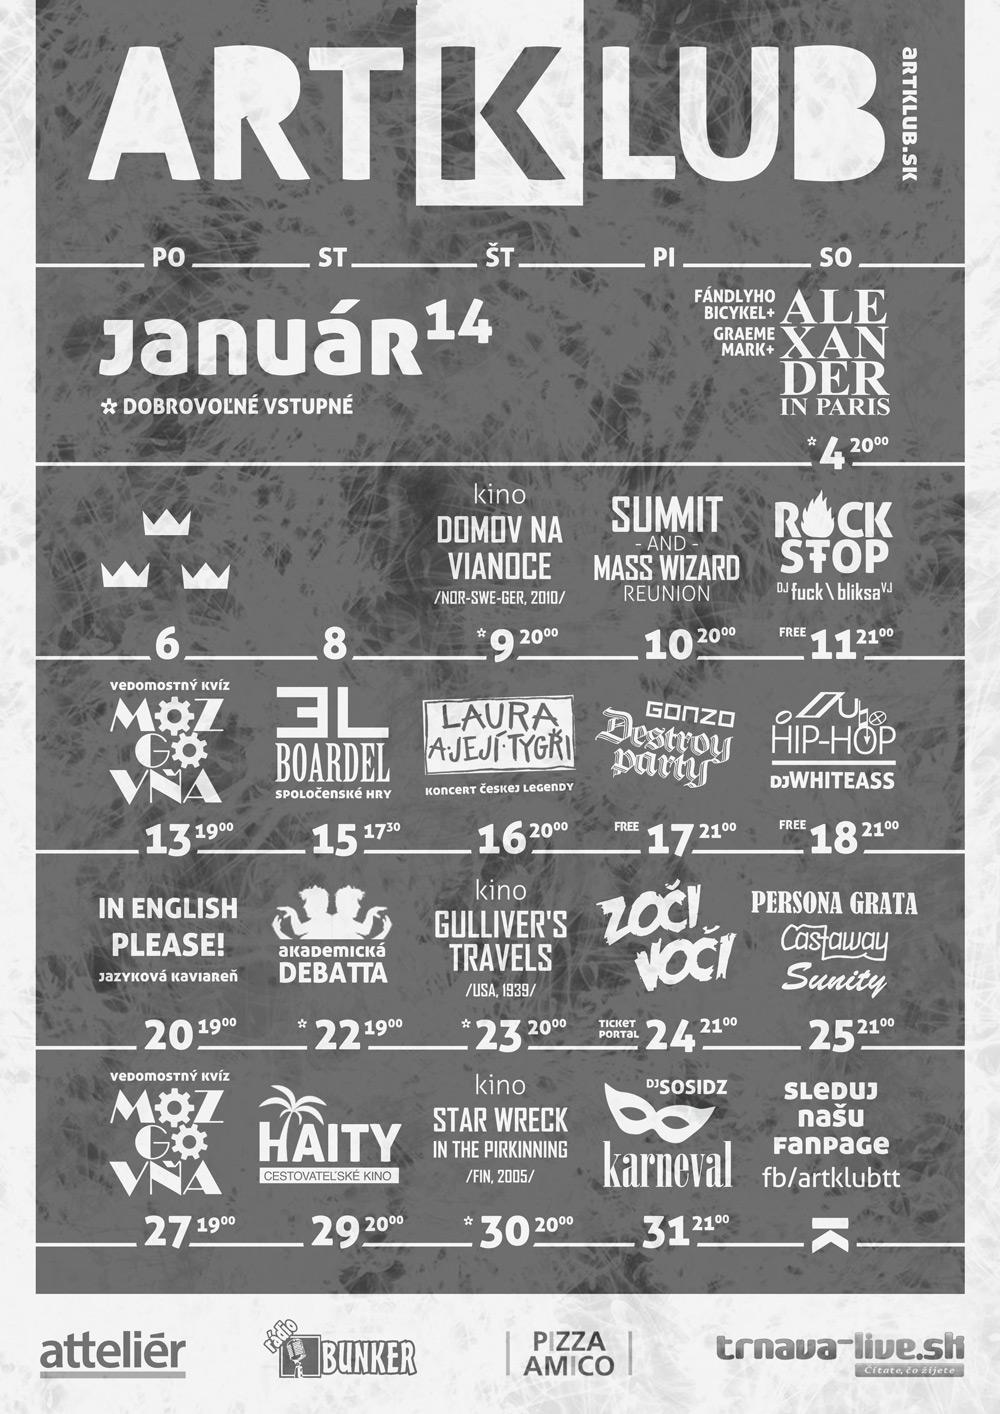 januar-web-artklube